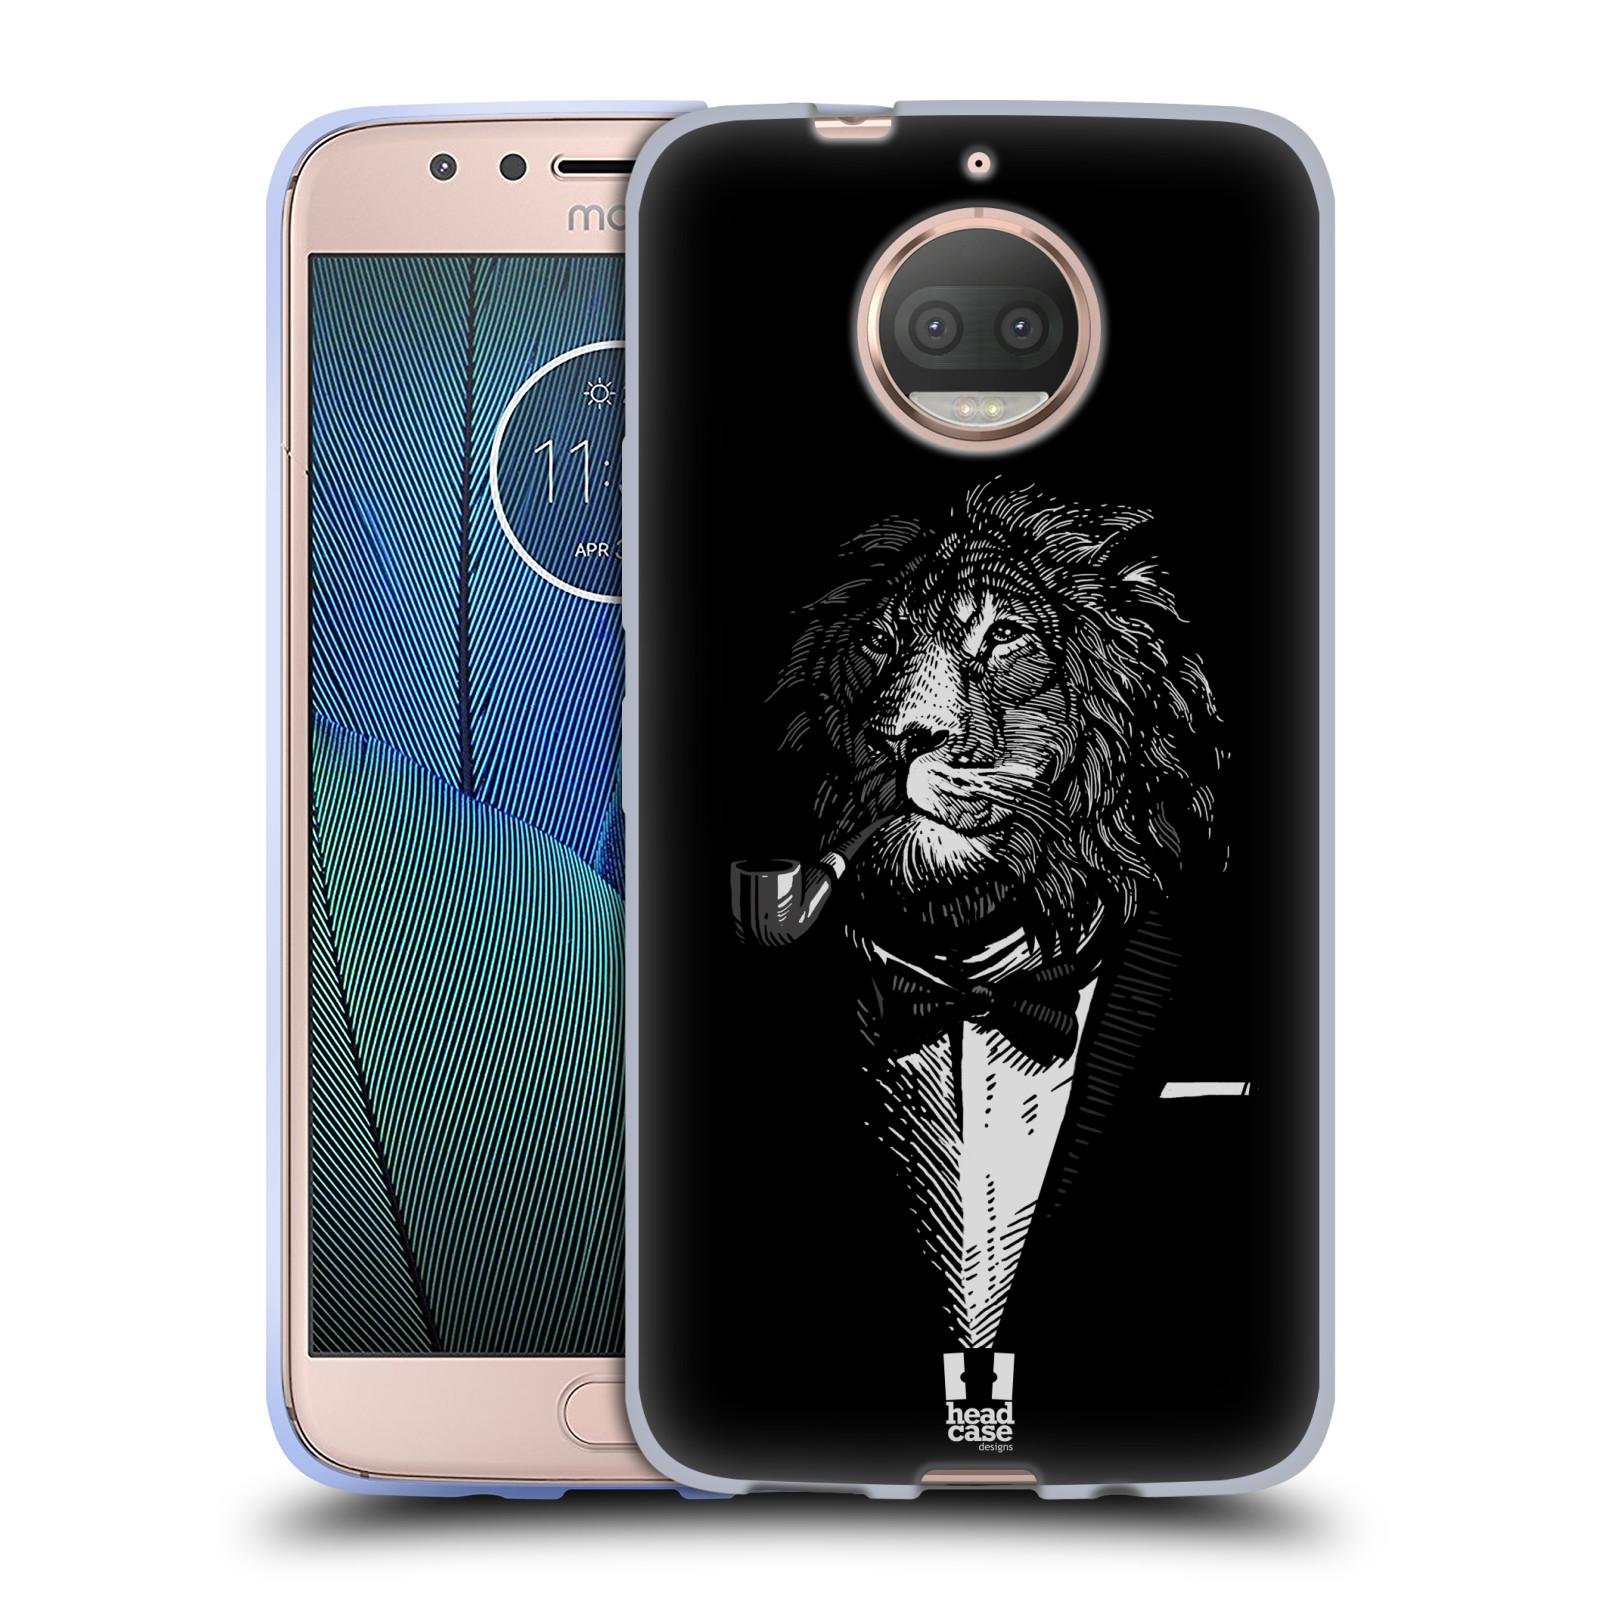 HEAD CASE silikonový obal na mobil Lenovo Moto G5s PLUS vzor Zvíře v obleku lev